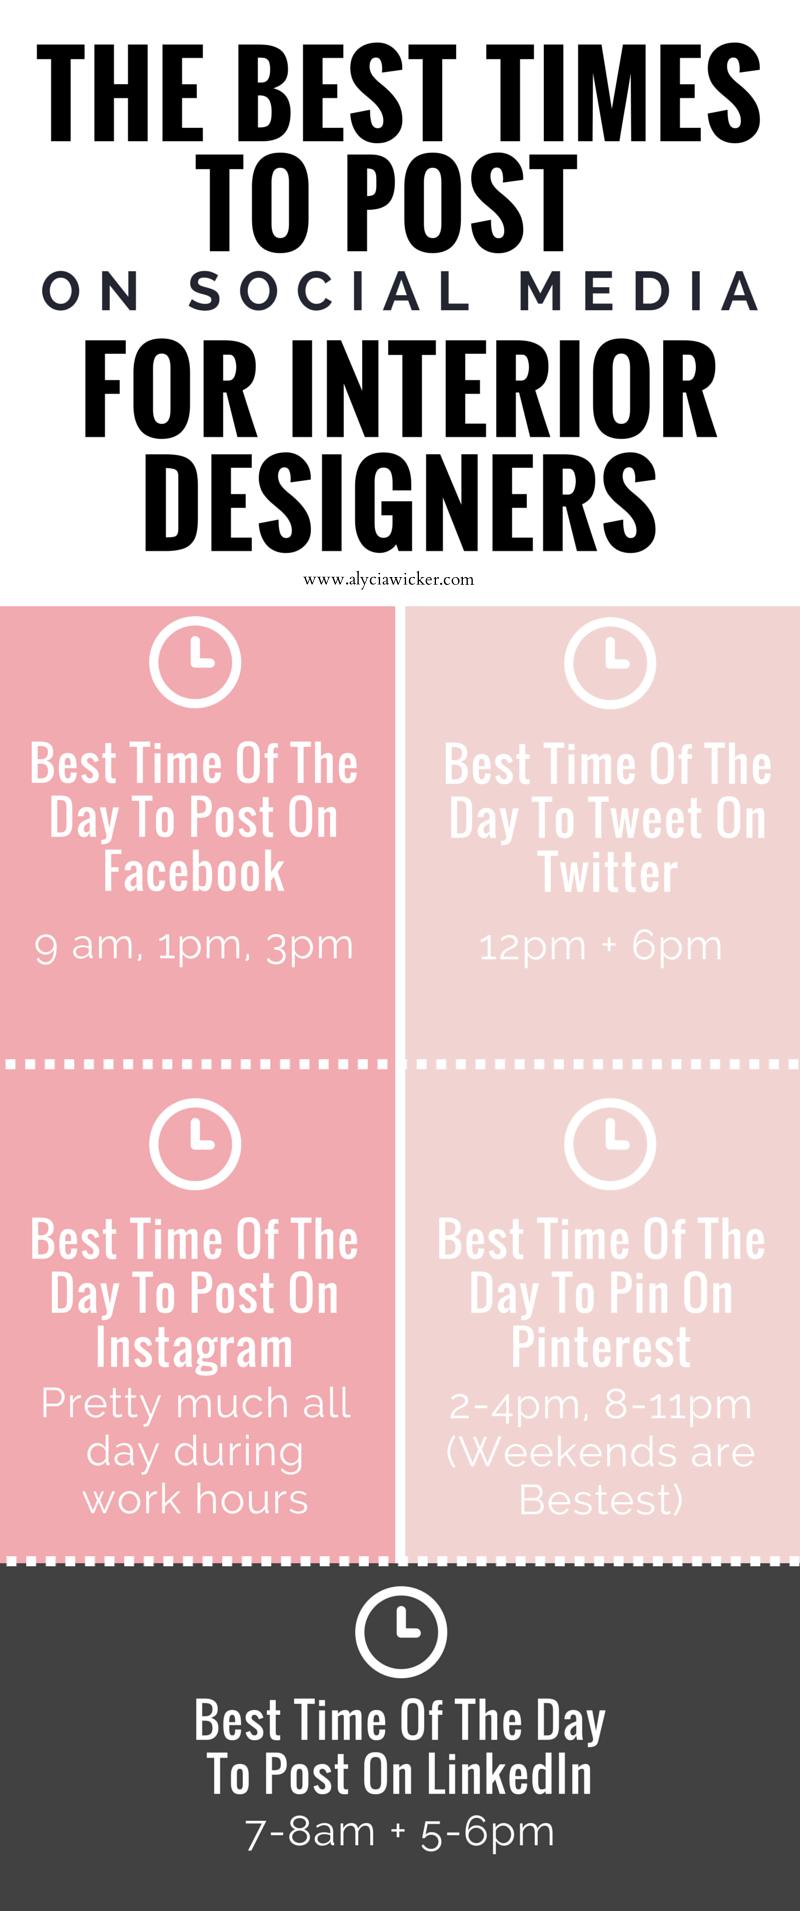 The best times to post on social media biz ness pinterest social media marketing and for Marketing plan for interior design business